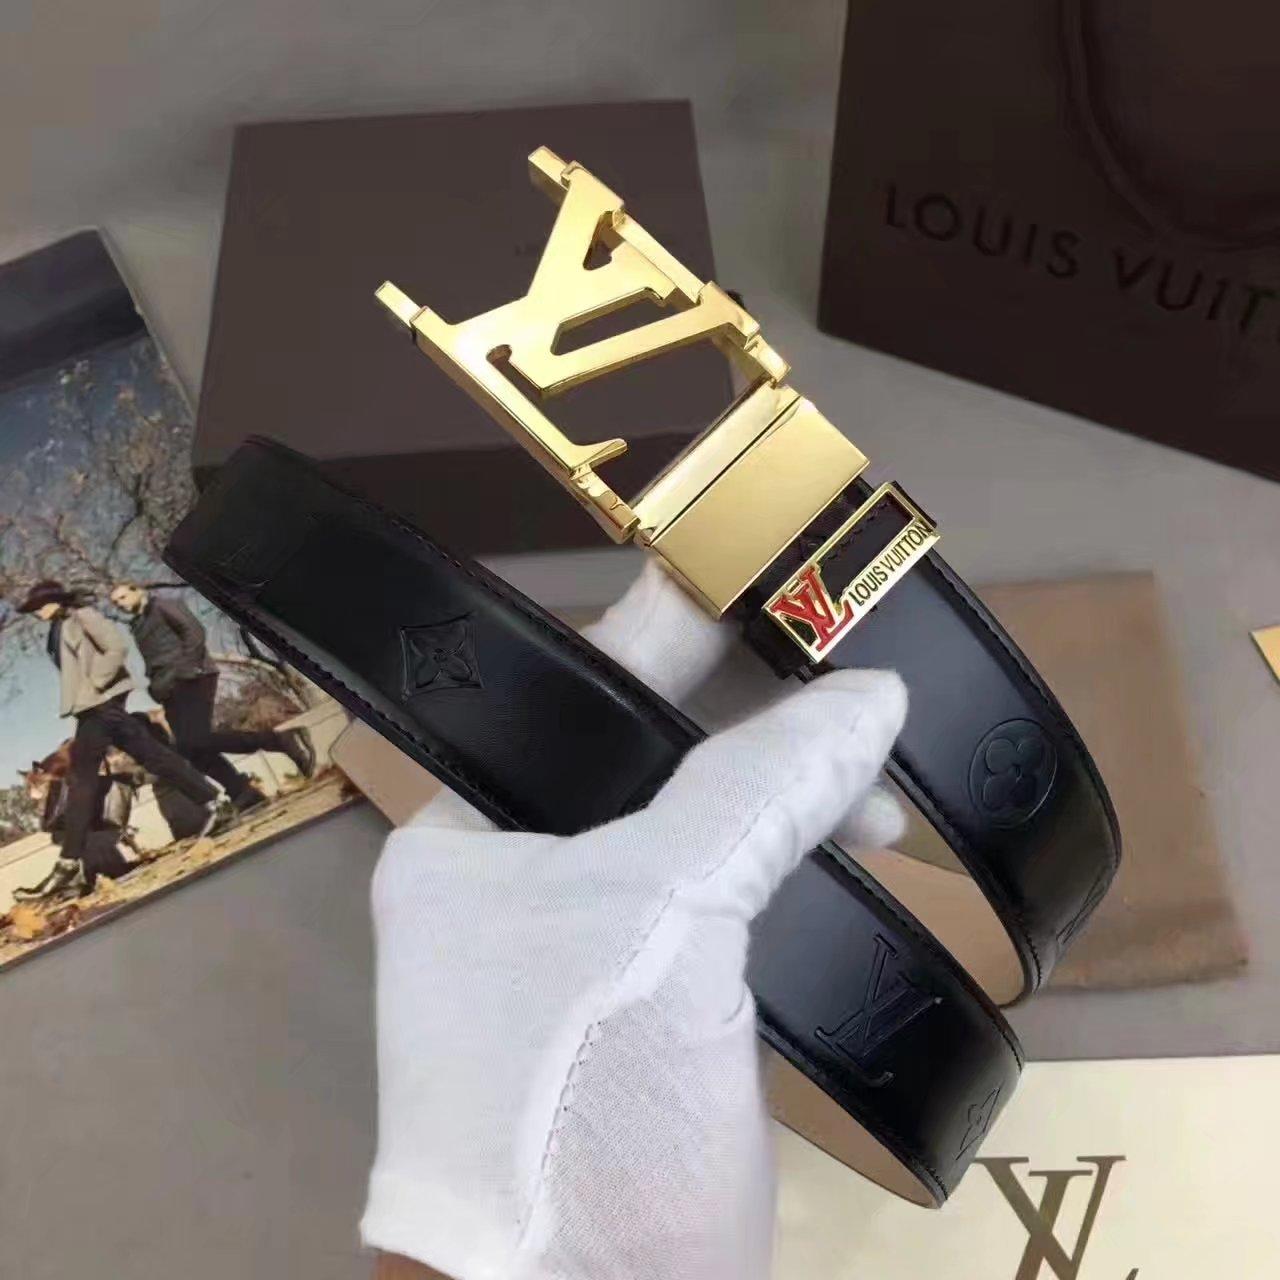 Louis Vuitton Men Reversible Belt With Gold Buckle 009